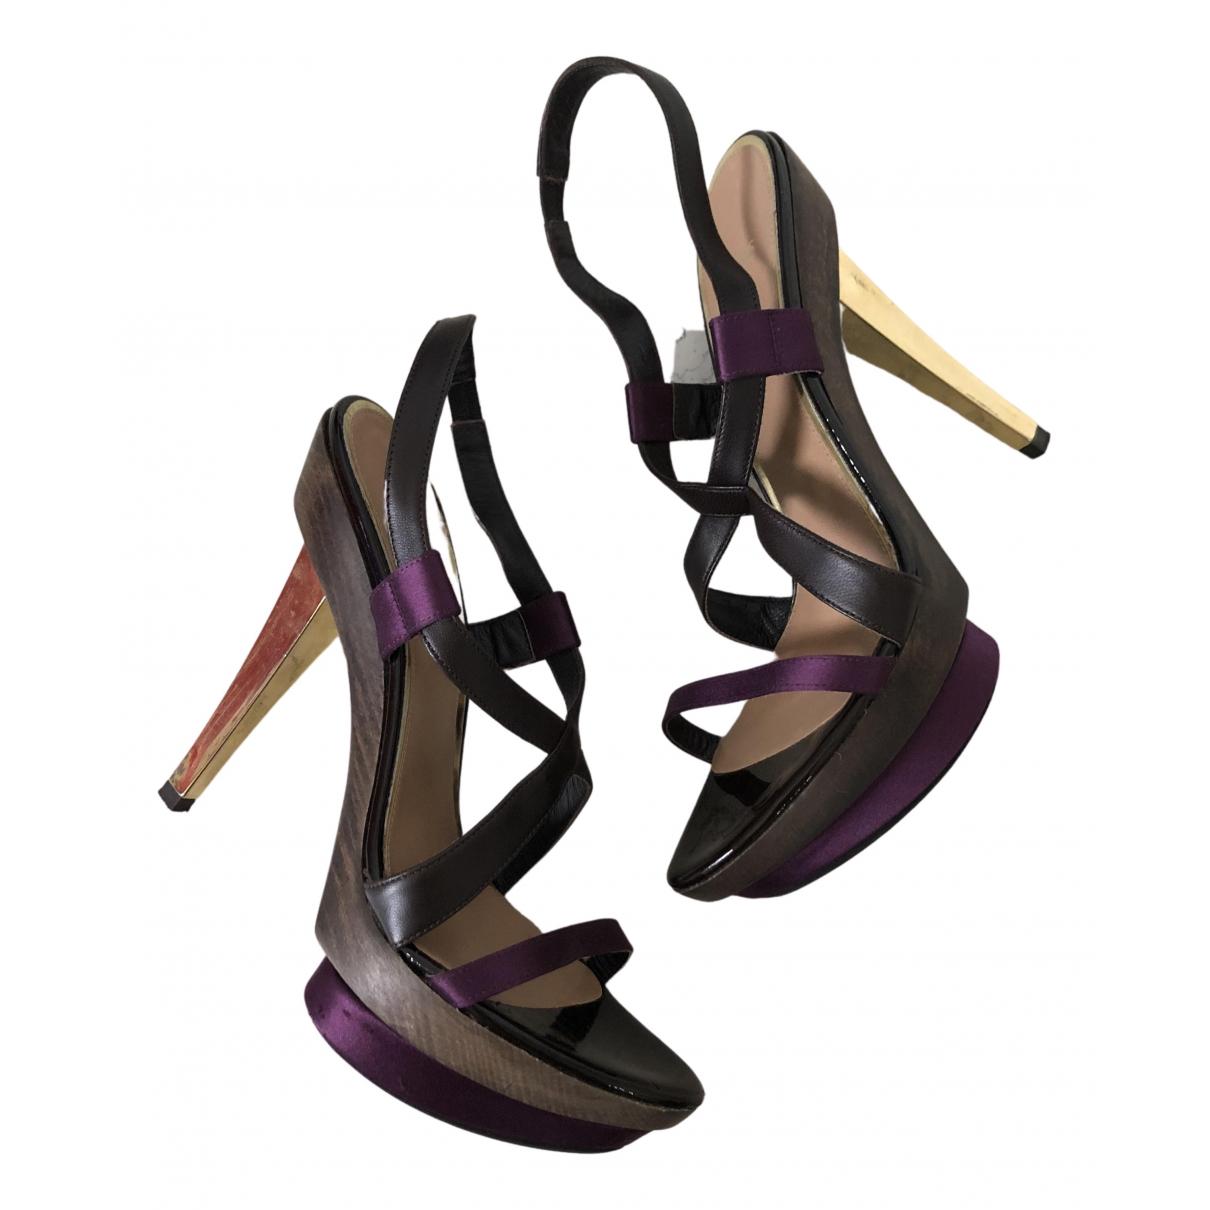 Hugo Boss N Multicolour Fur Sandals for Women 38 EU